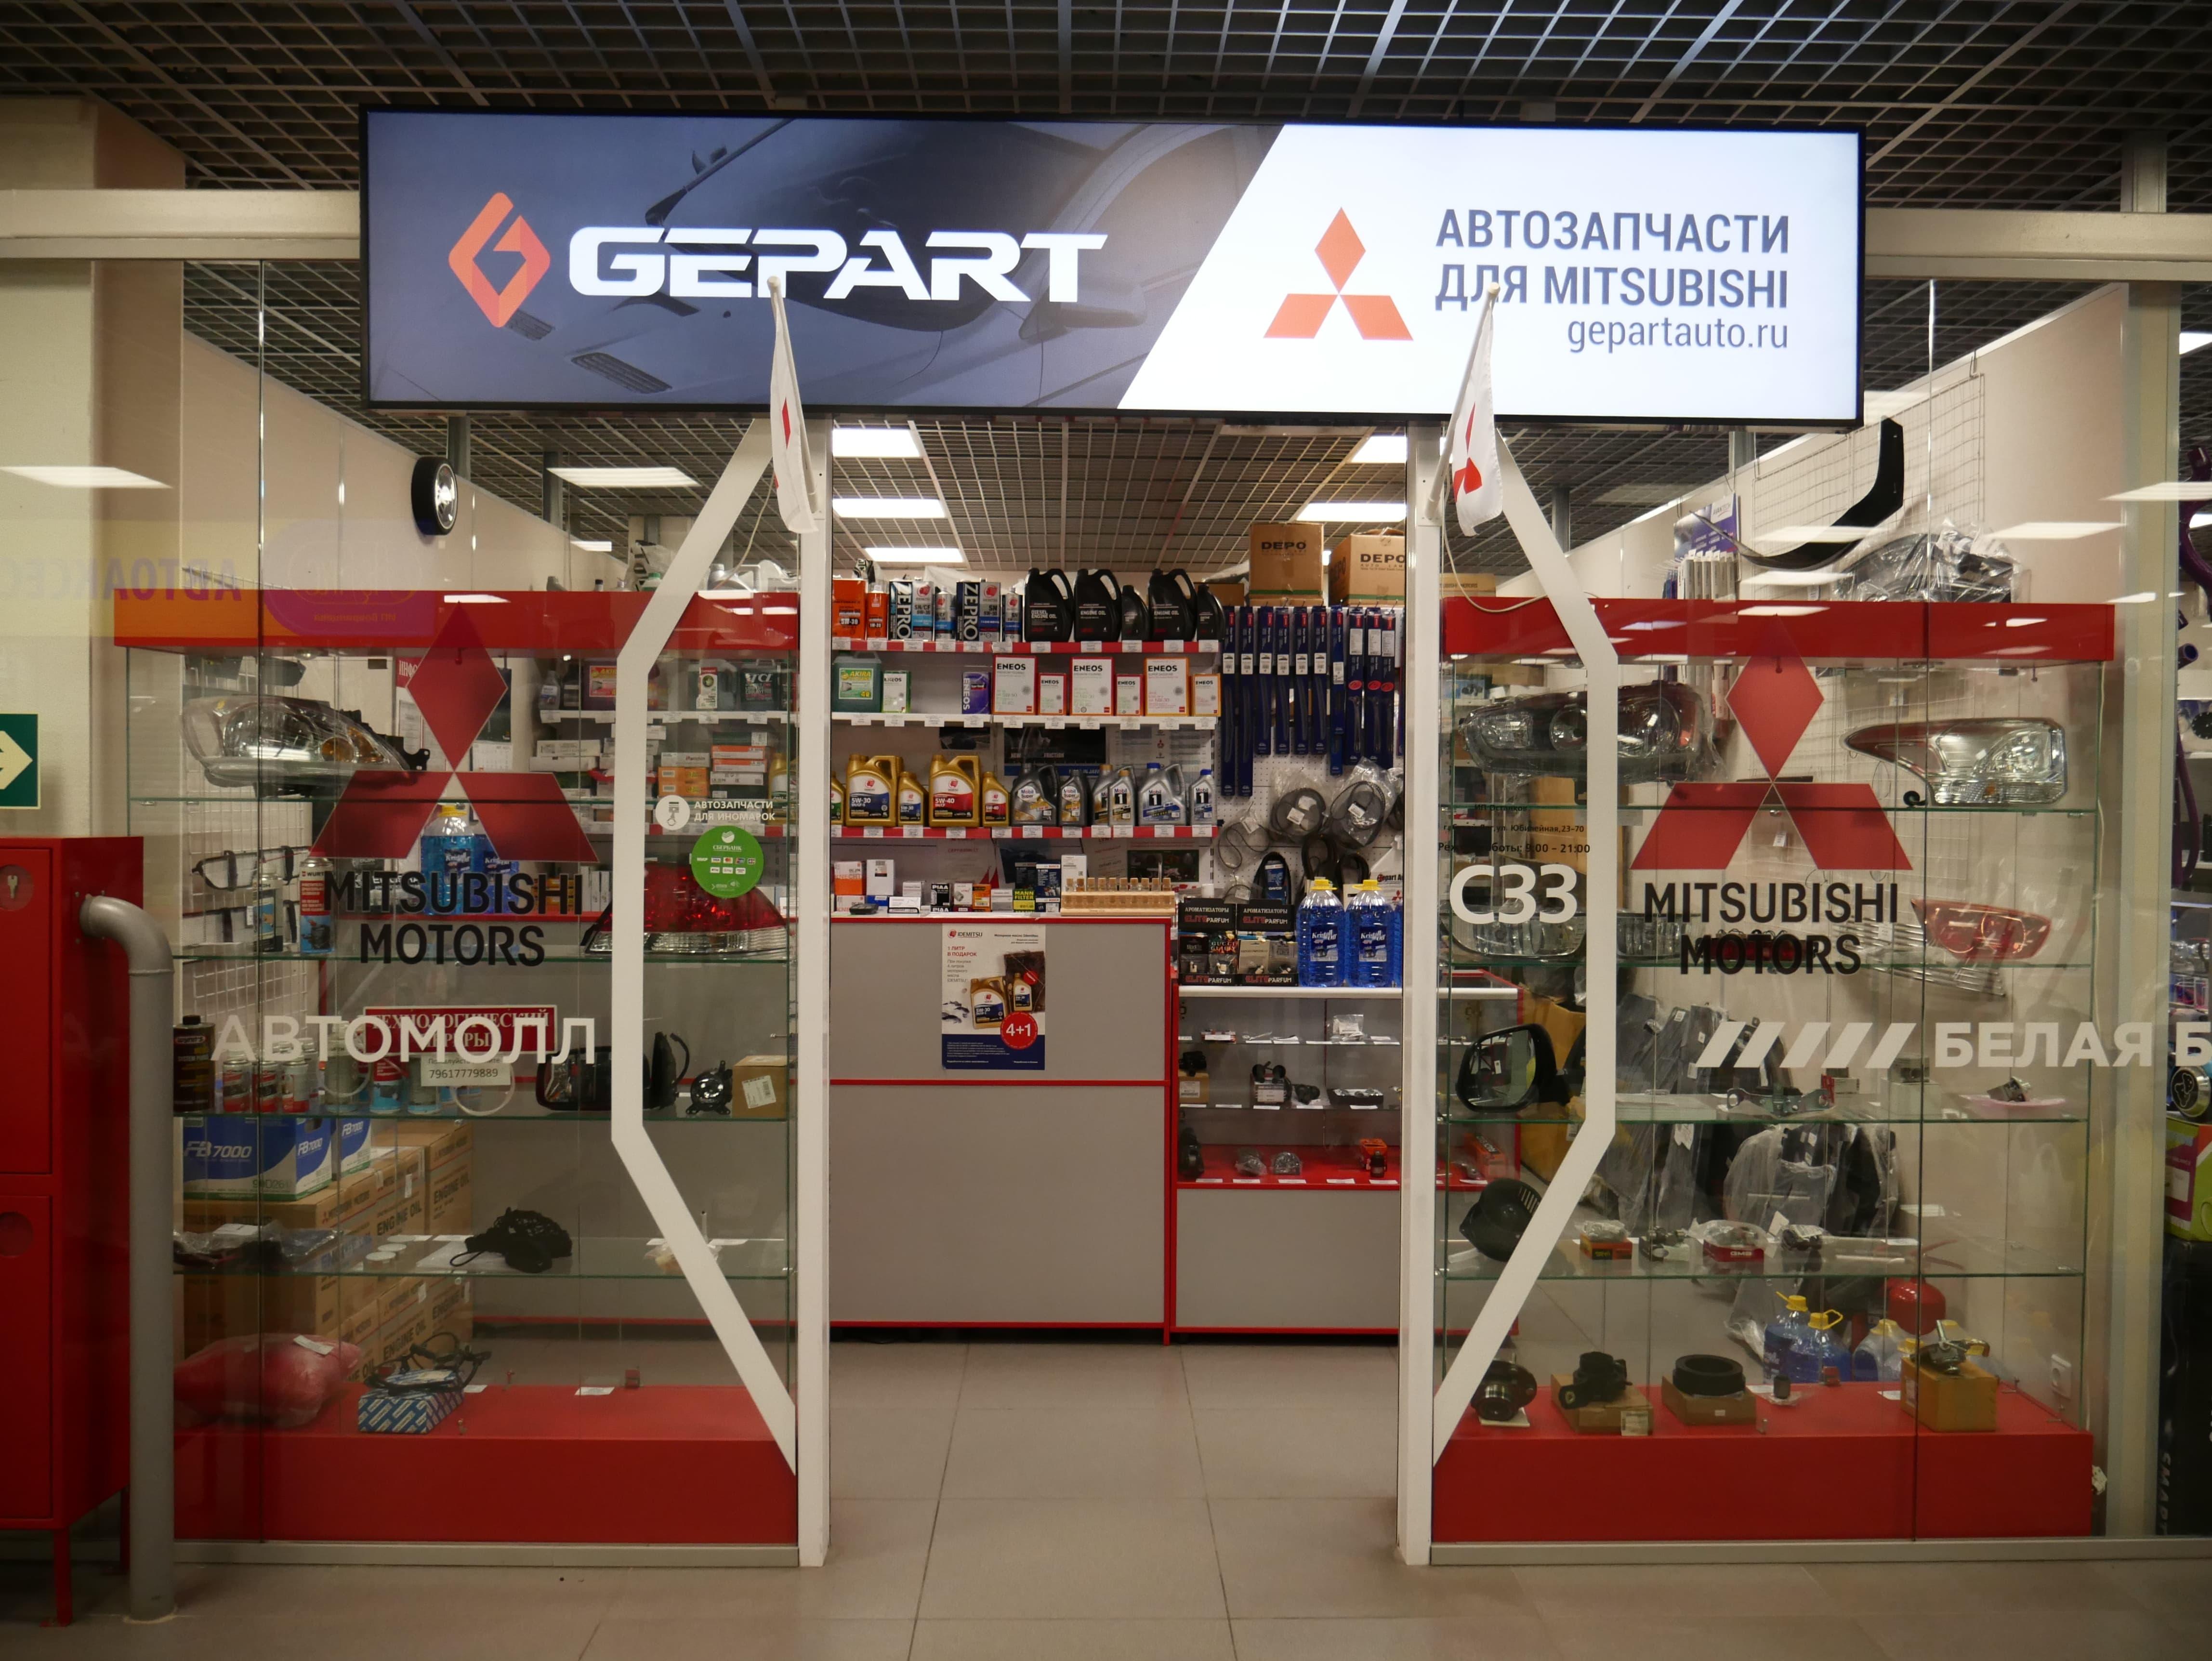 магазин GepartAuto автозапчасти для митсубиси